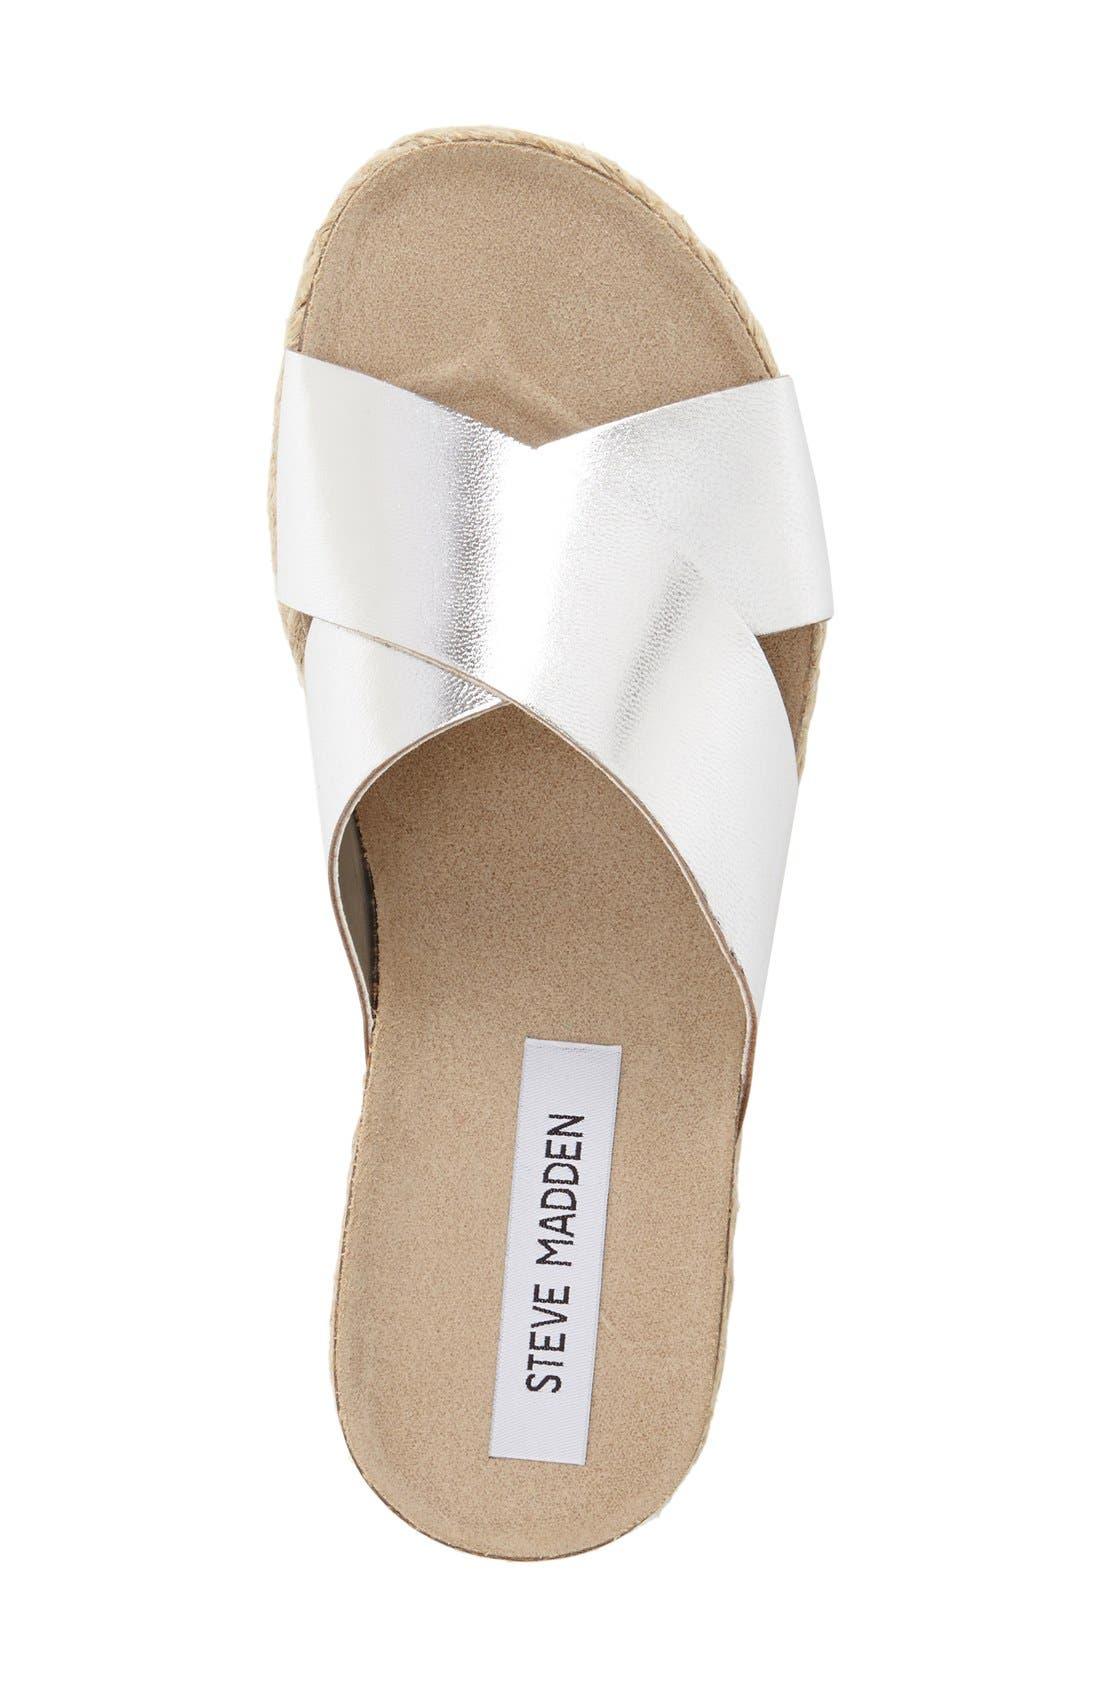 Alternate Image 3  - Steve Madden 'Arran' Espadrille Platform Sandal (Women)